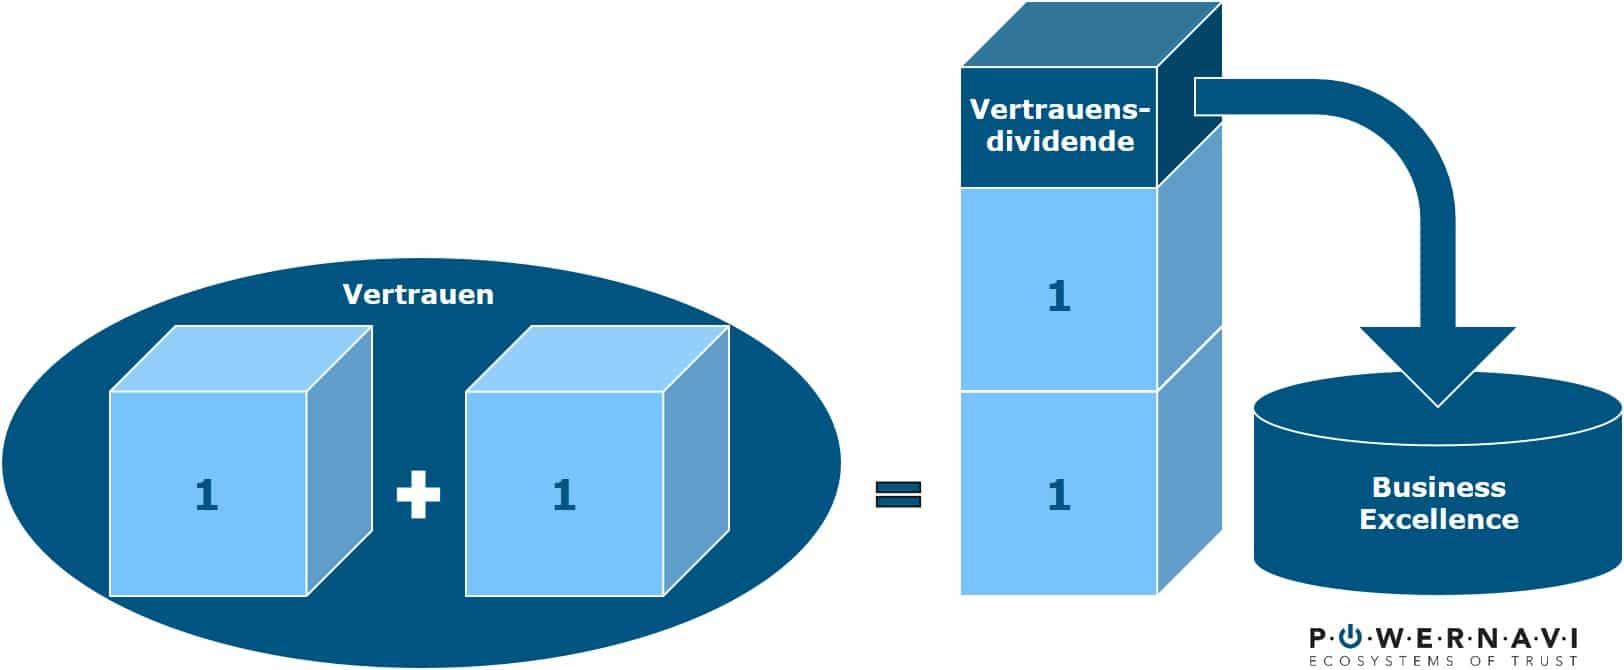 Vertrauensdividende powernavi ecosystems of trust